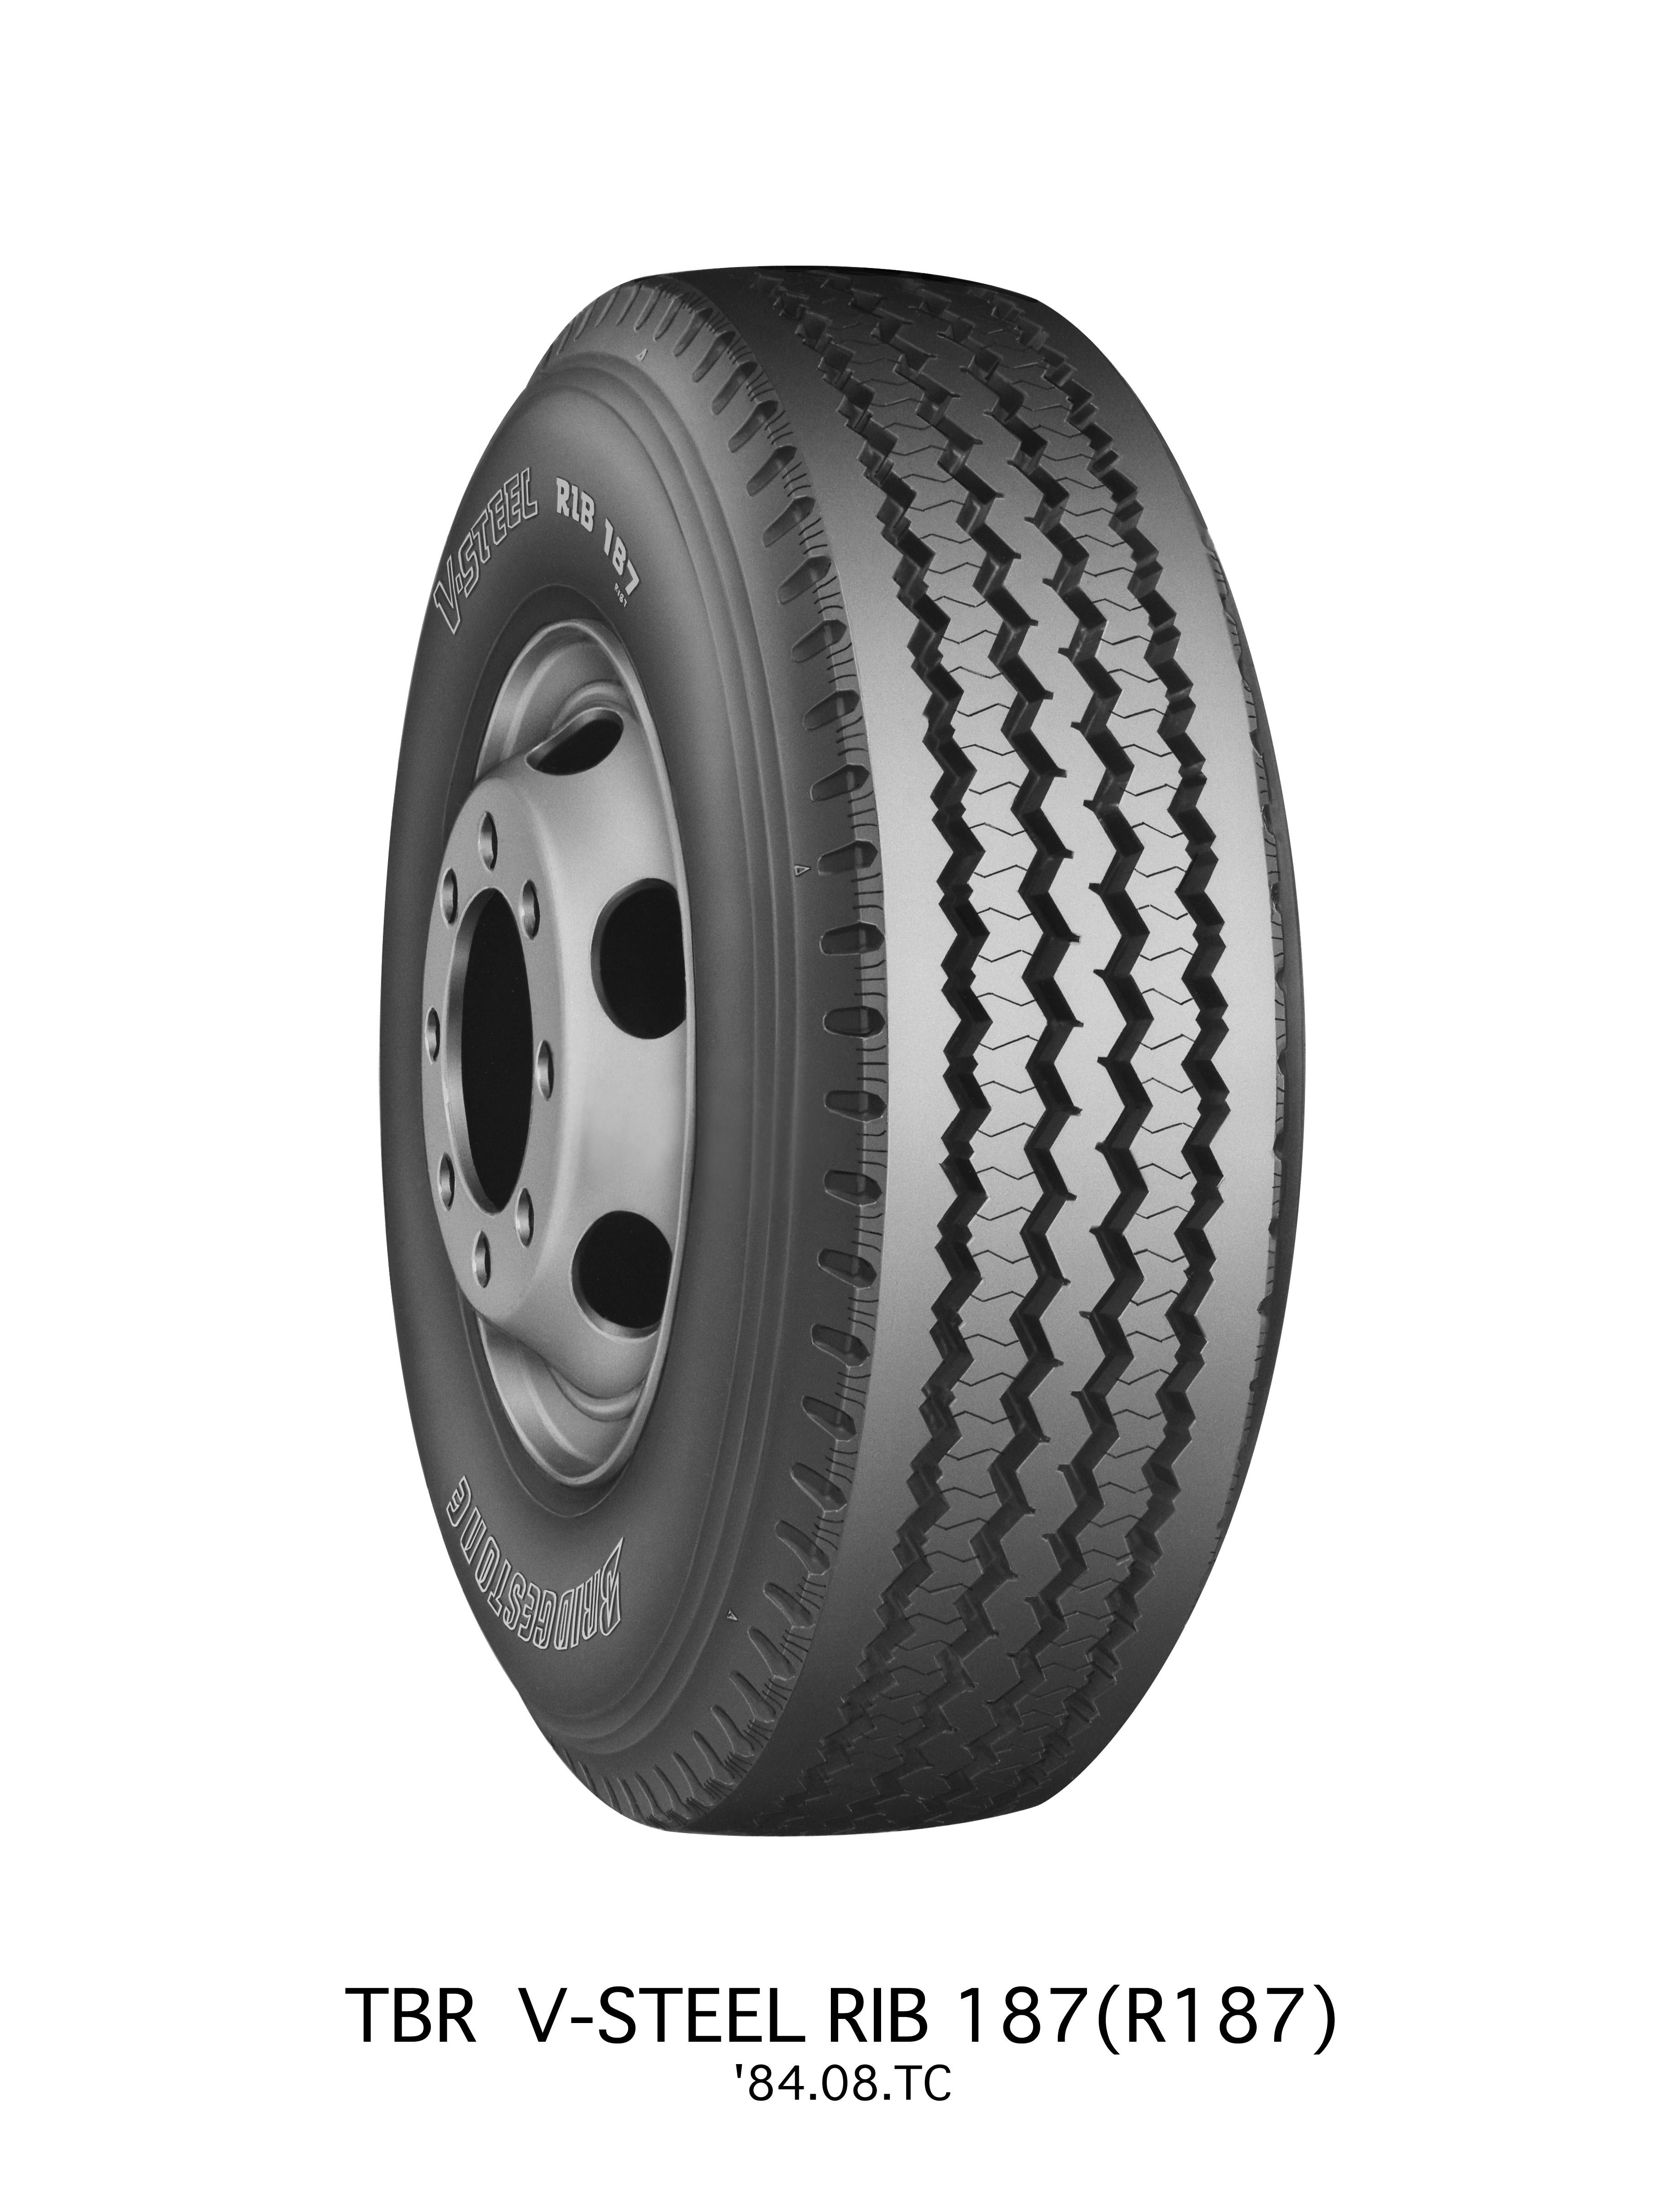 1000-20 R16  R187 Bridgestone Thailand